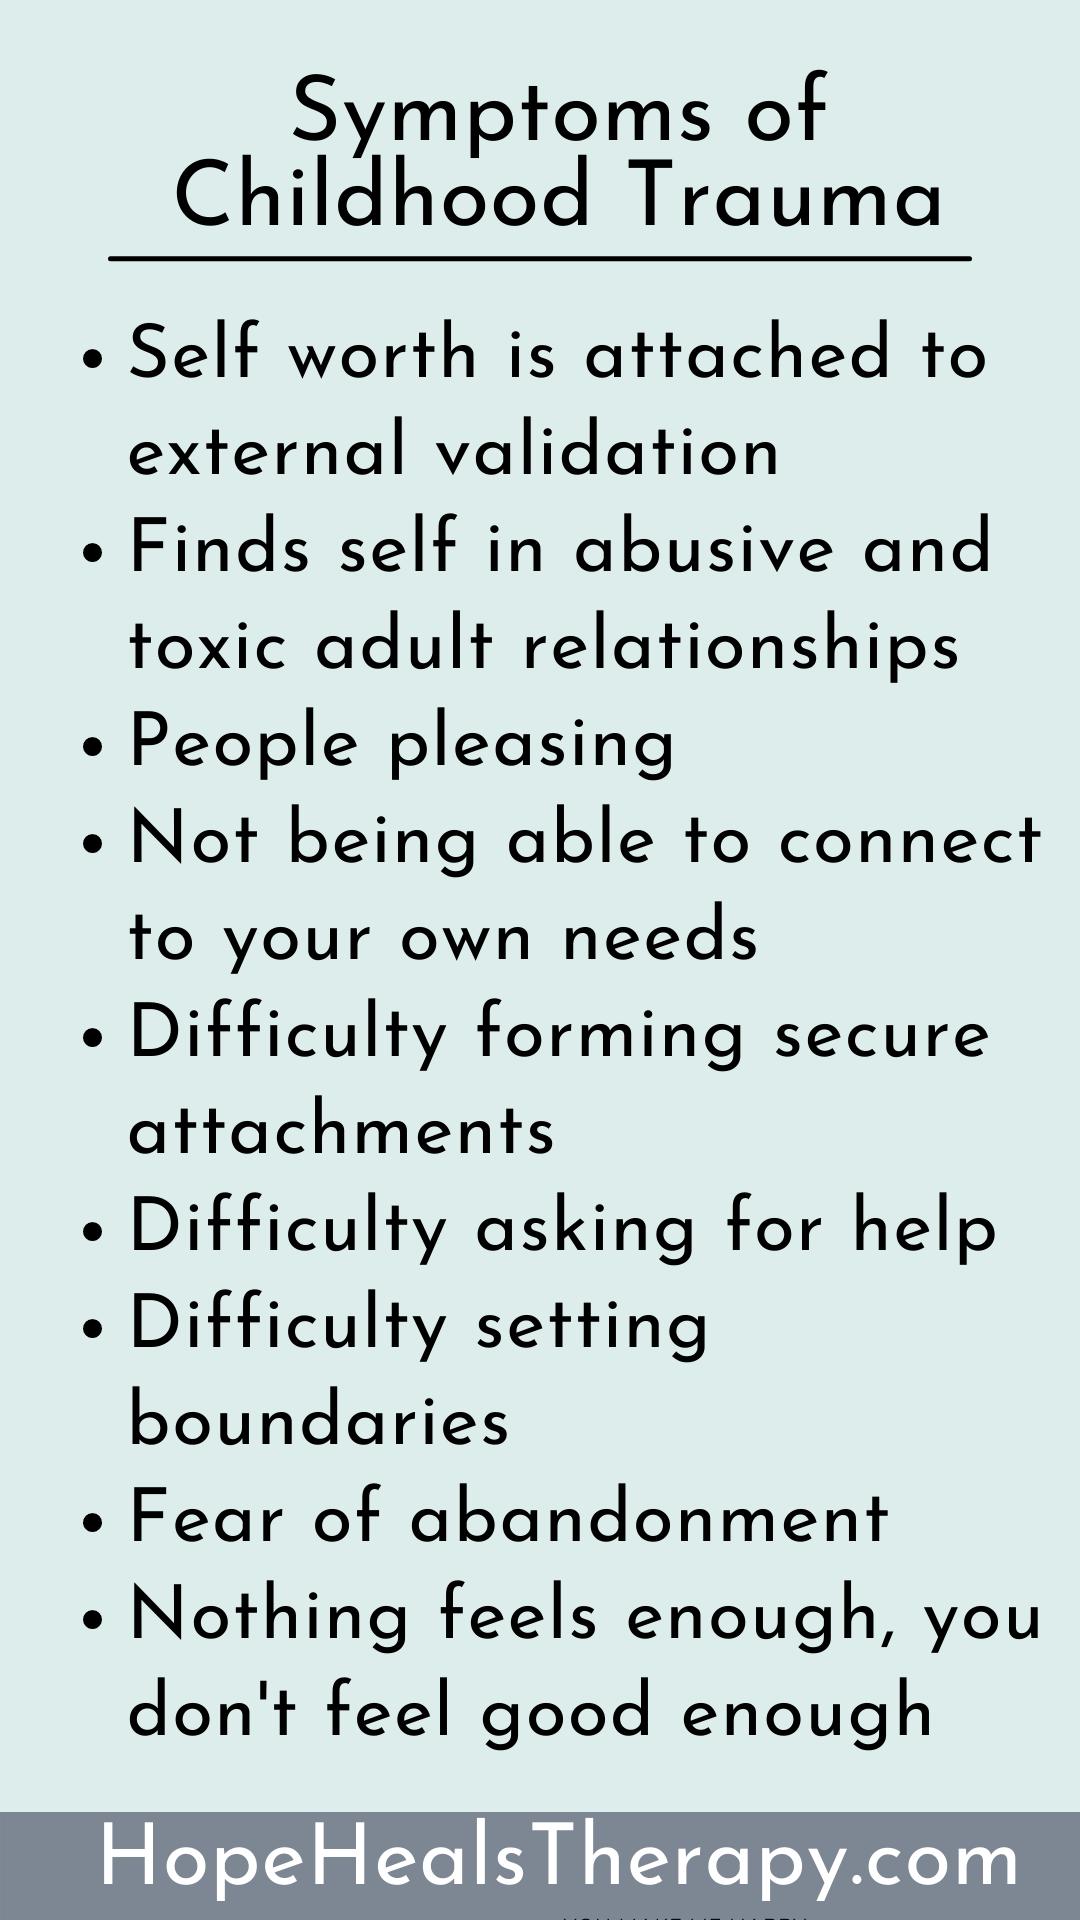 Symptoms-of-childhood-trauma